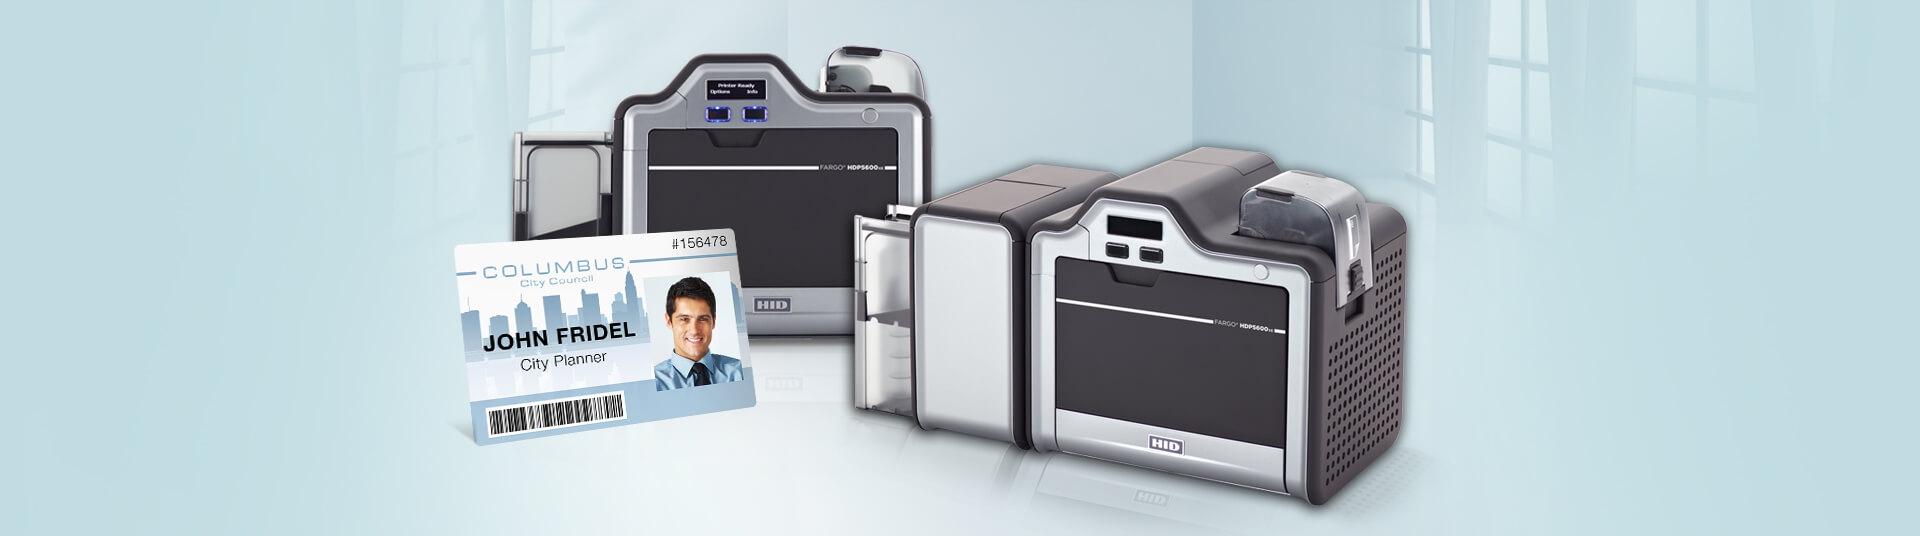 Fargo HDP5600XE ID Card Printers